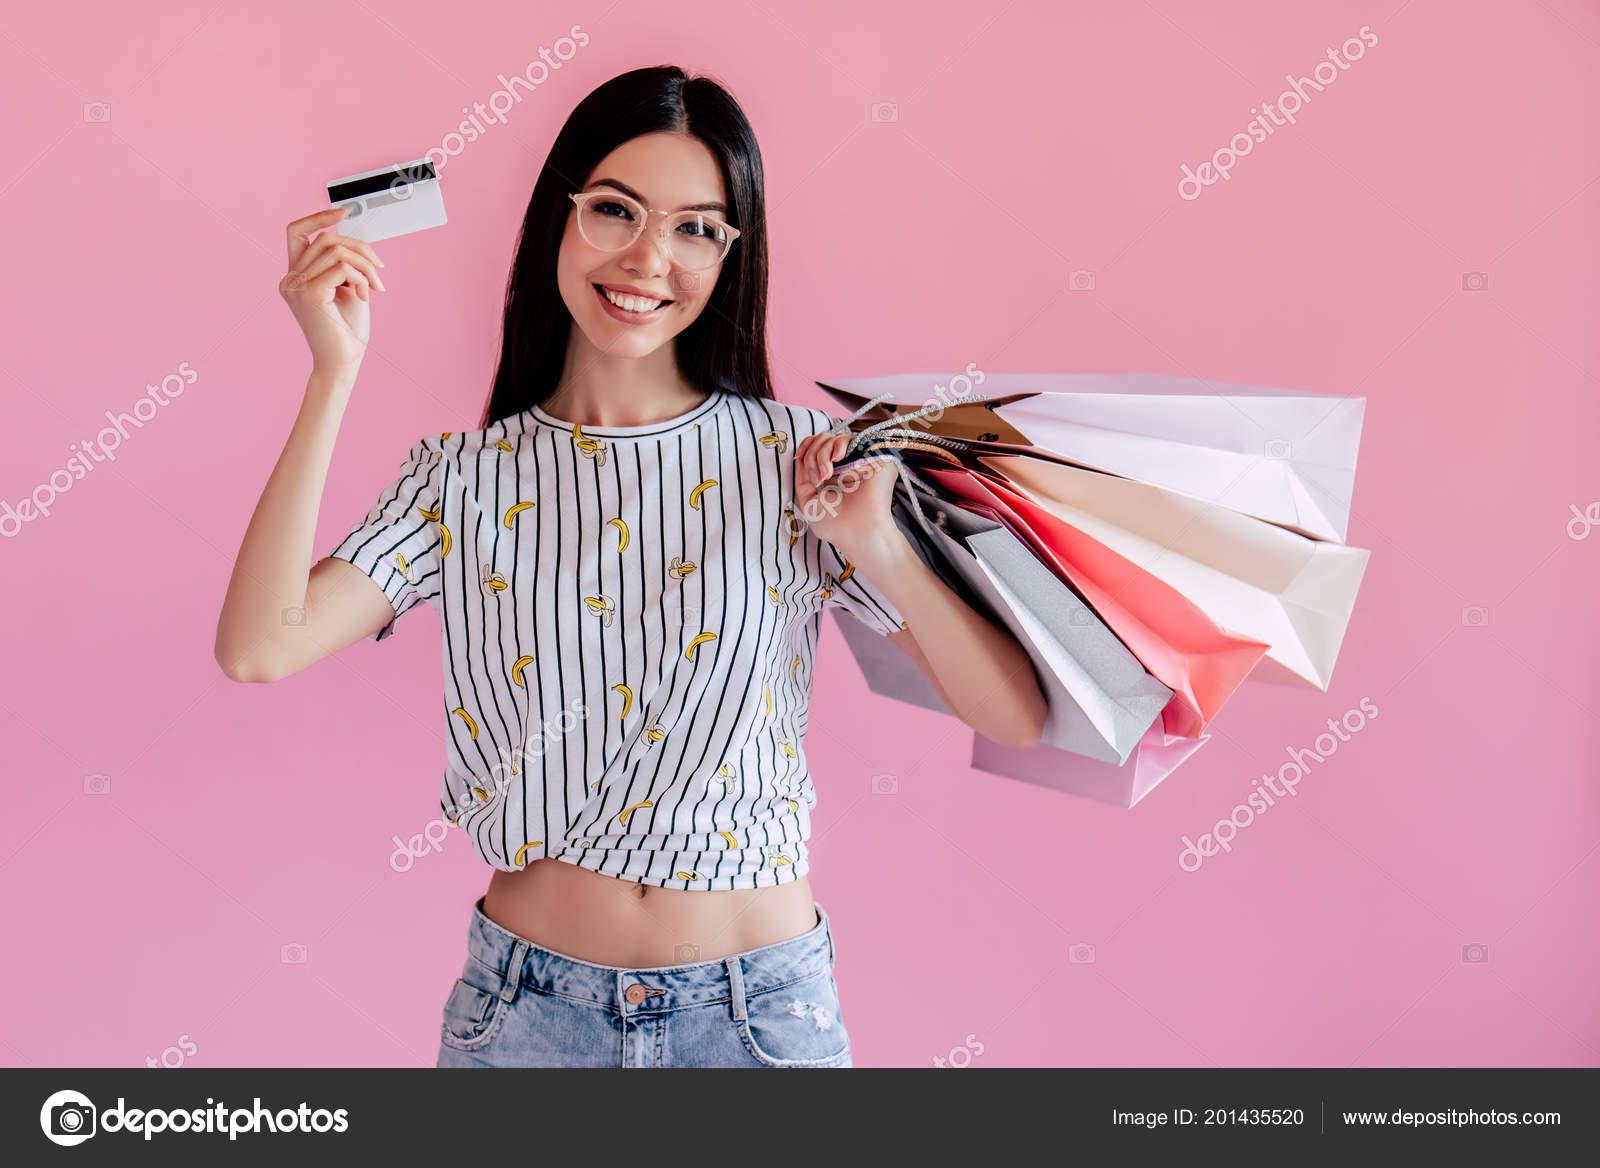 Asian Teenage Girl Pink Background Stylish Young Woman